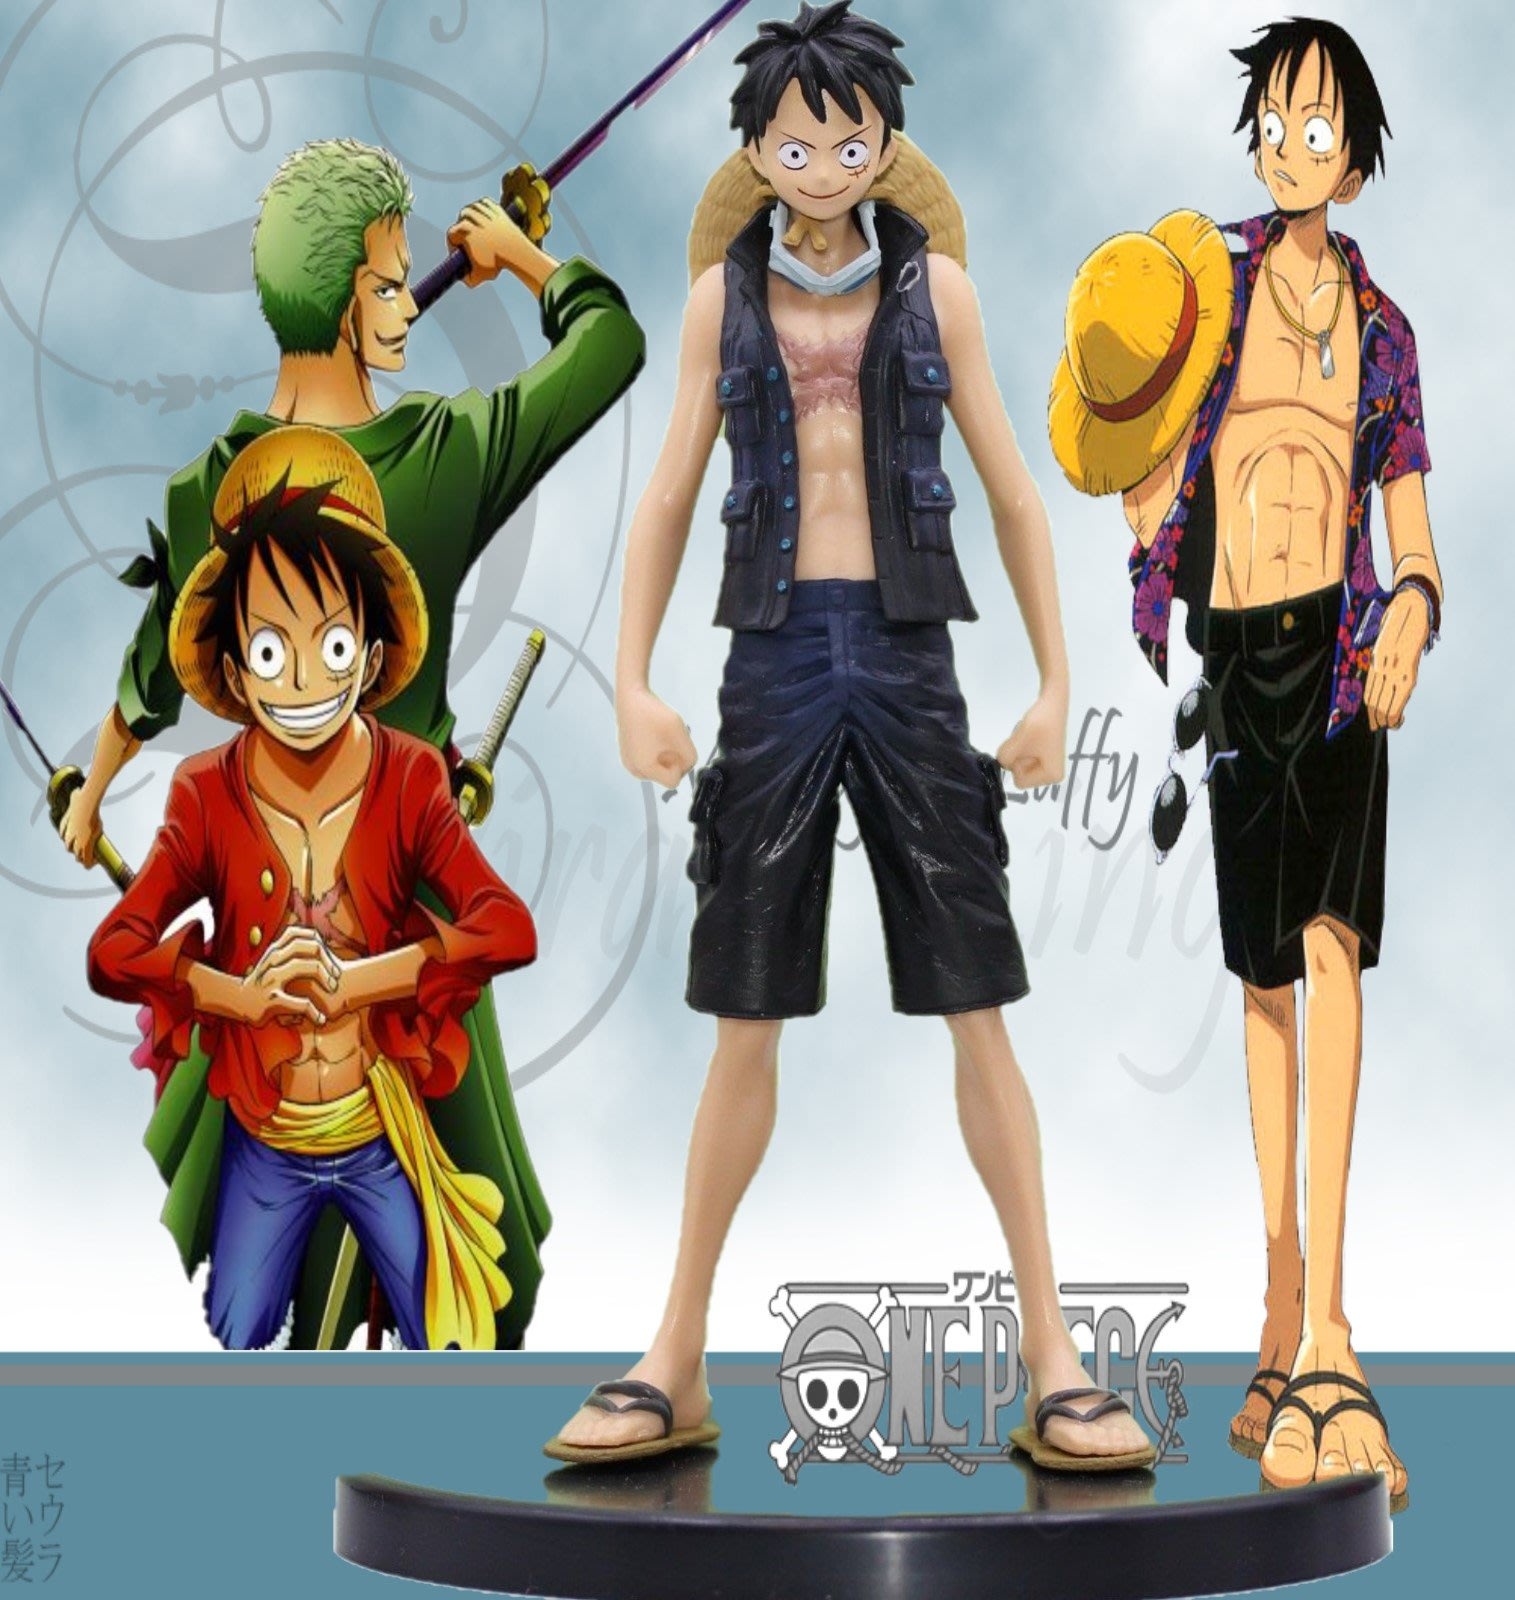 GON103 / LUFFY 海賊王日本動漫 / One Piece Japanese Anime / 17cm